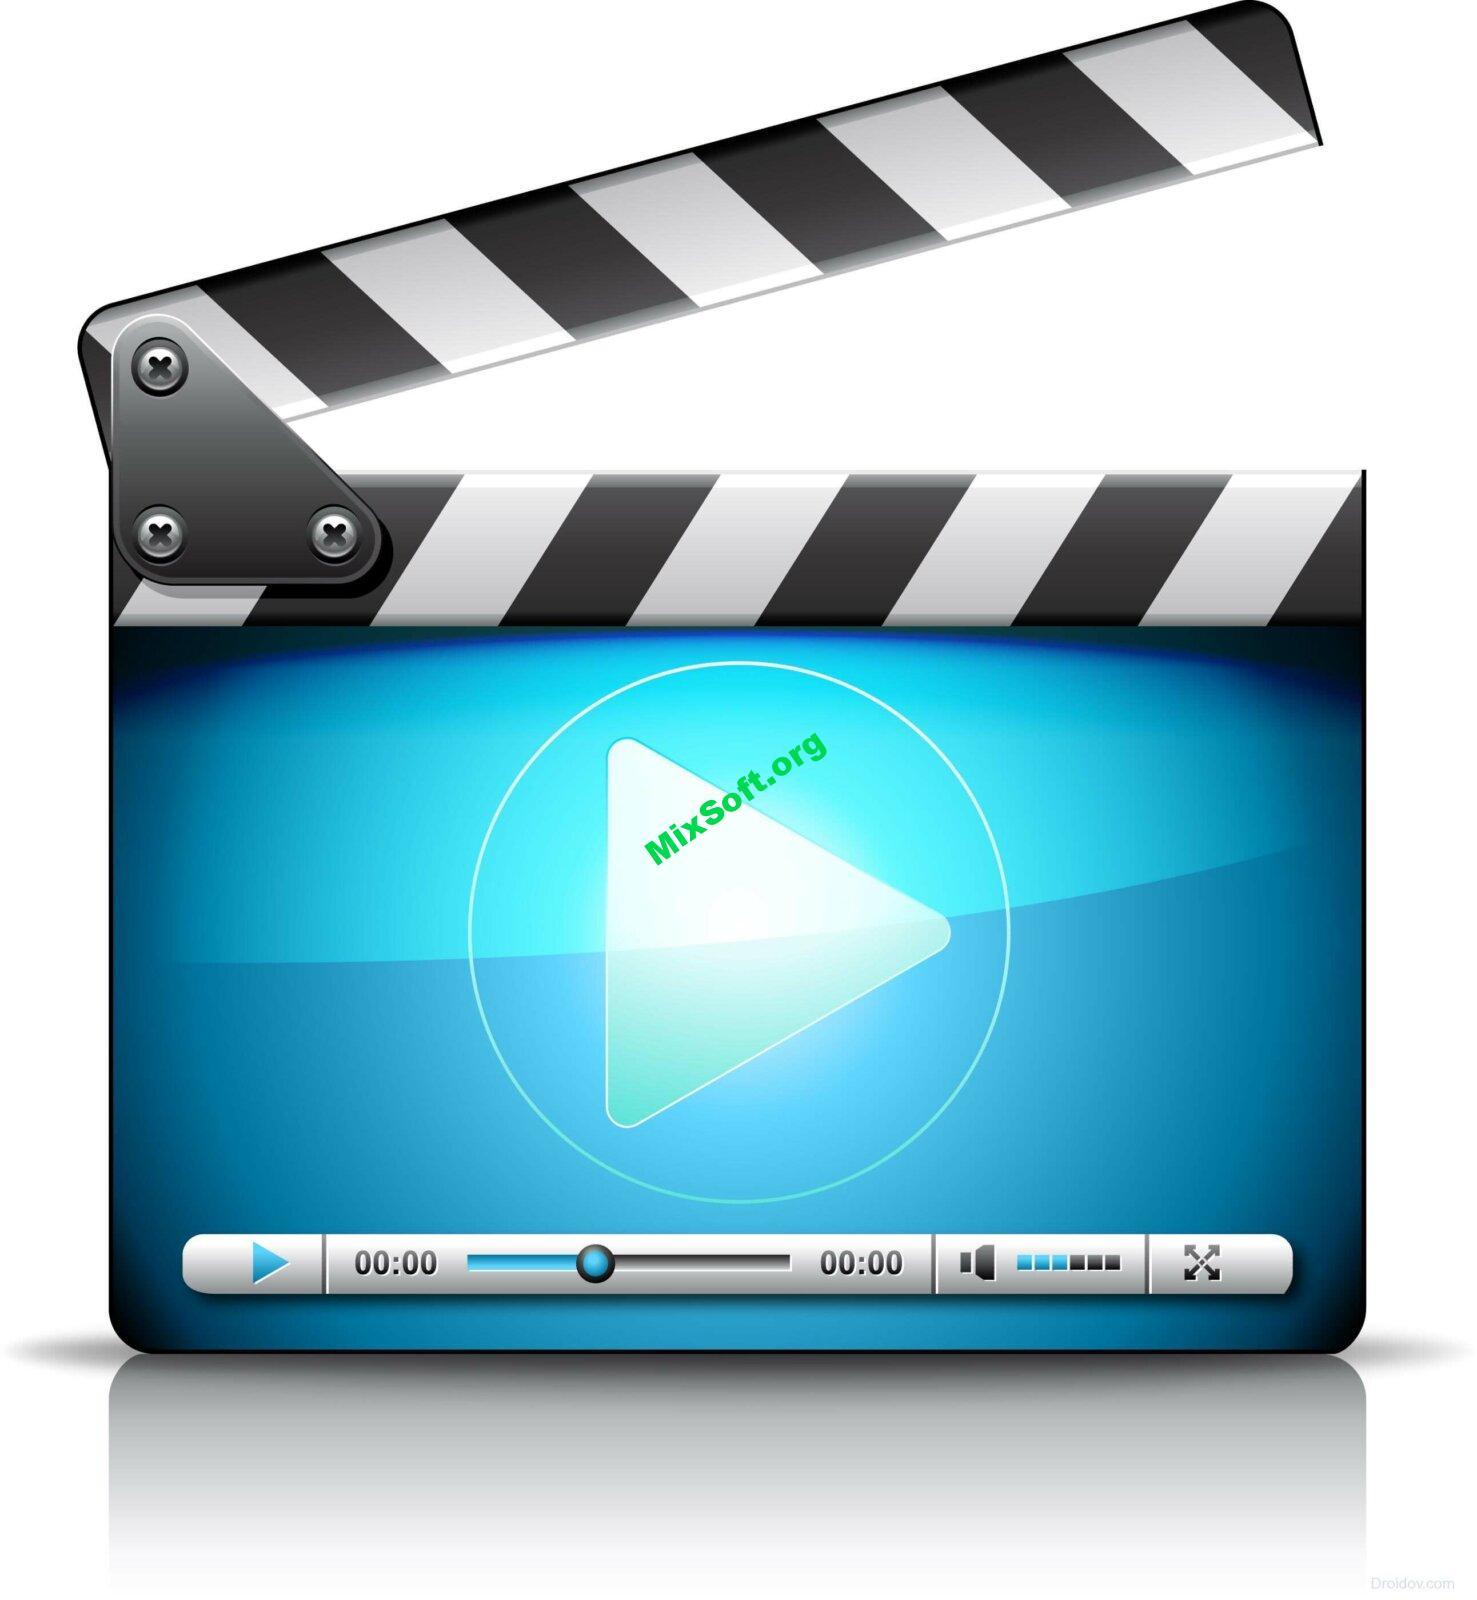 Экранная Камера 3.15 RePack by KaktusTV — Скачать бесплатно